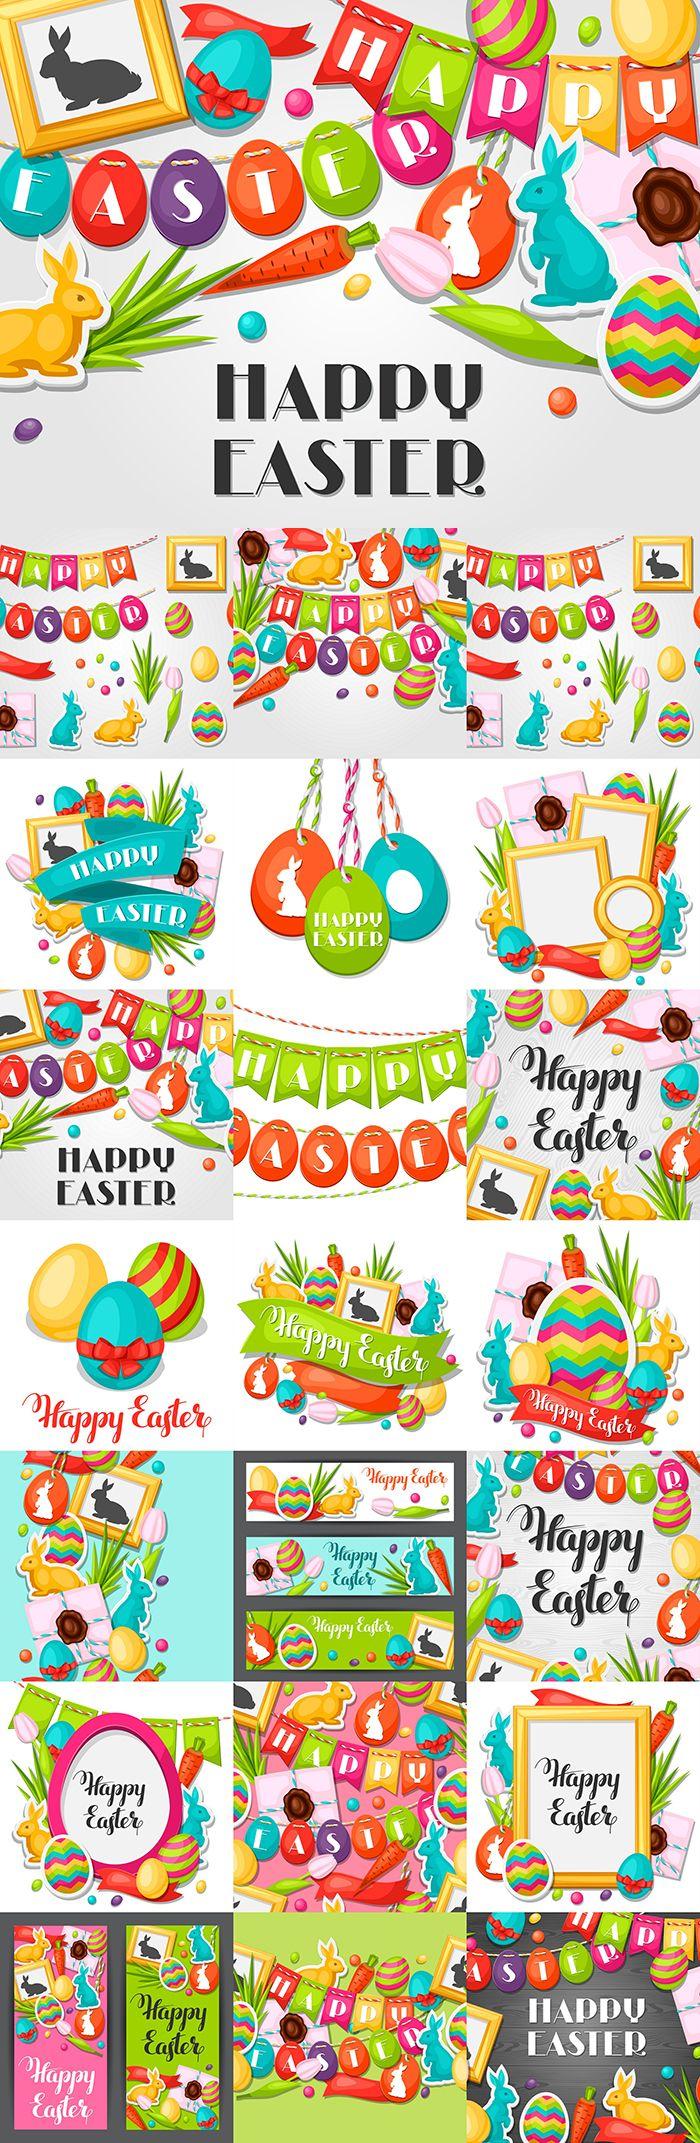 Блог Колибри: Happy Easter photo frame with decorative objects, ...